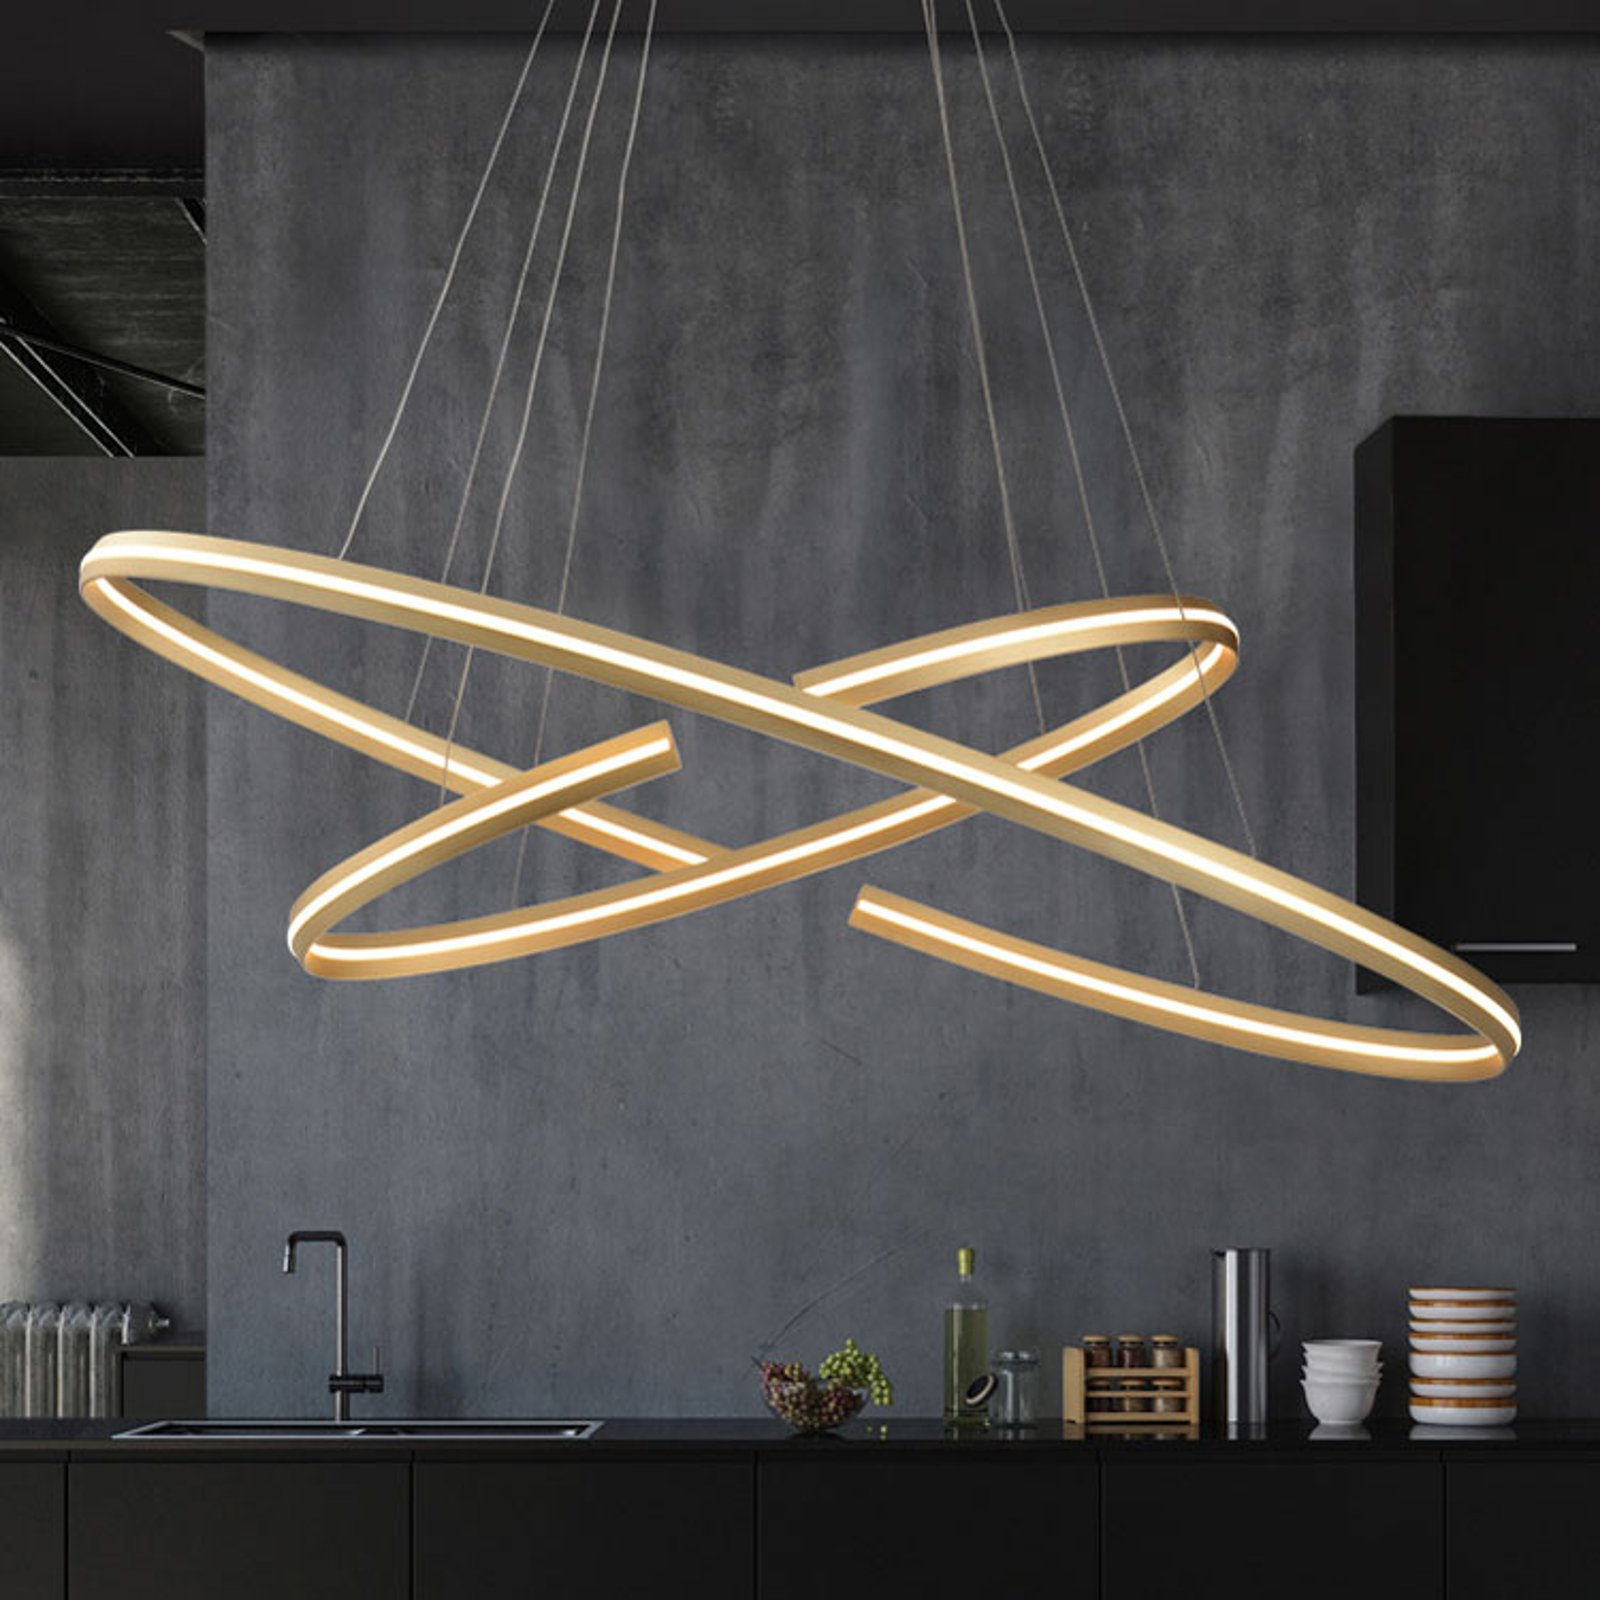 LED-hengelampe Elipse i oval form, 120x60 cm